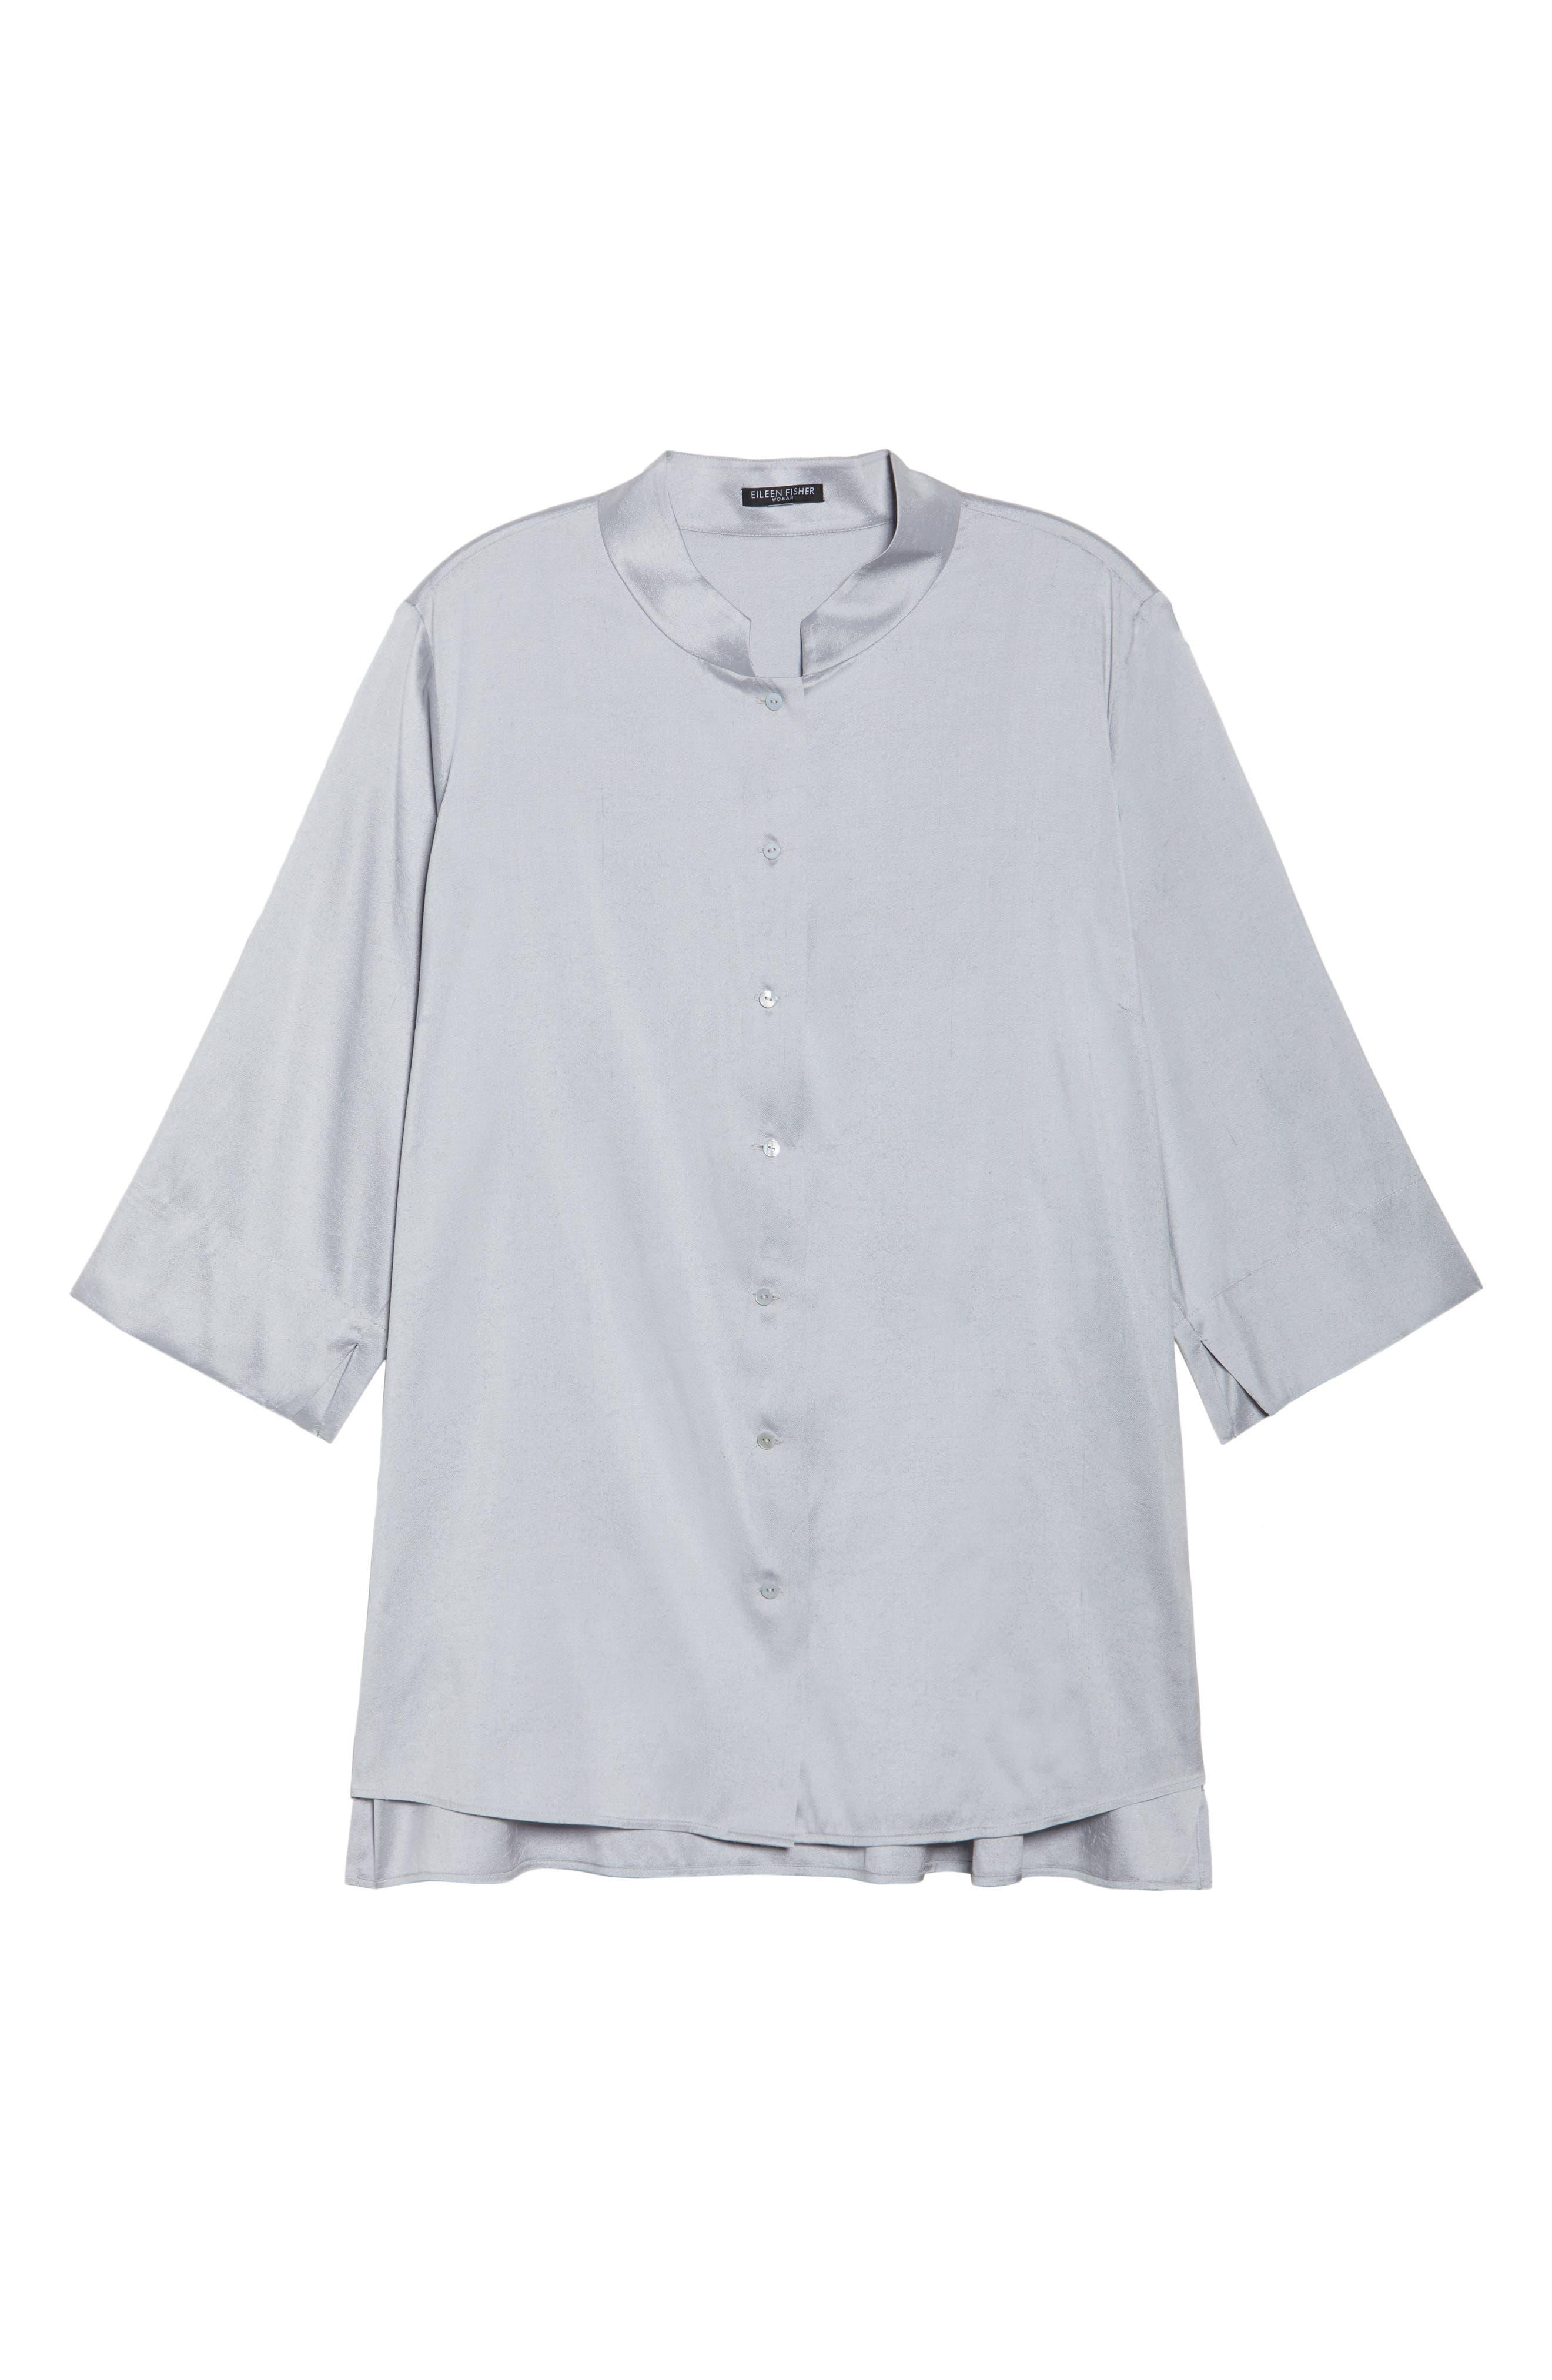 Notch Collar Shirt,                             Alternate thumbnail 11, color,